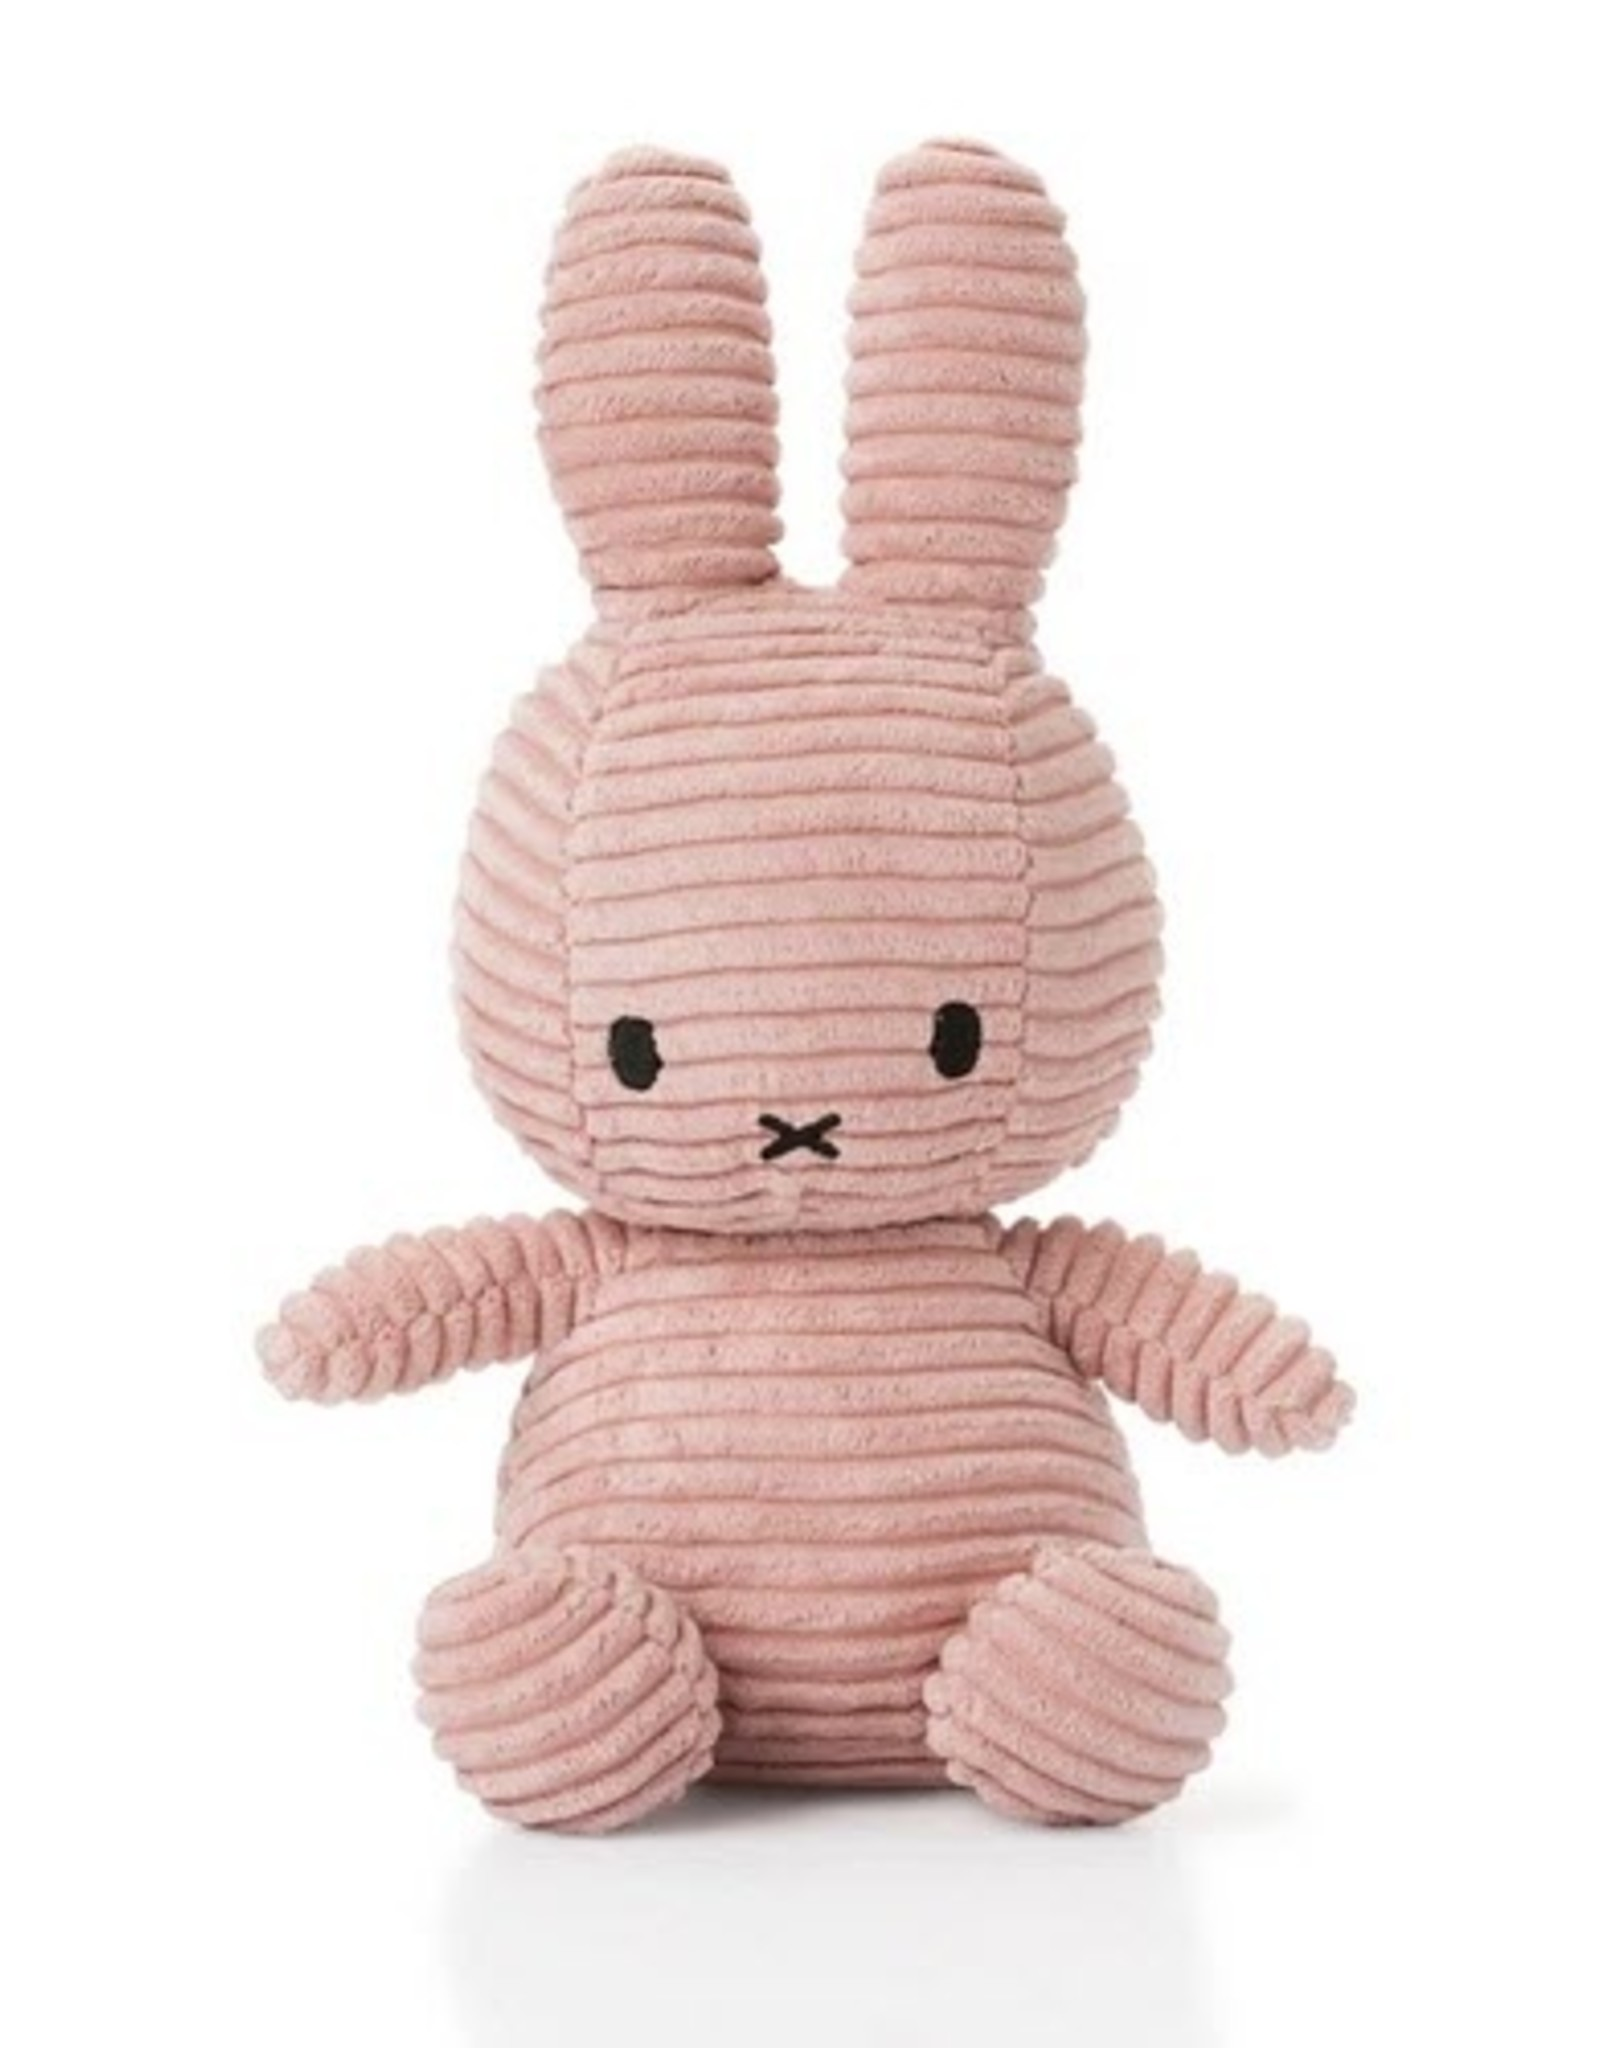 Miffy Miffy - Sitting Corduroy Pink 23cm